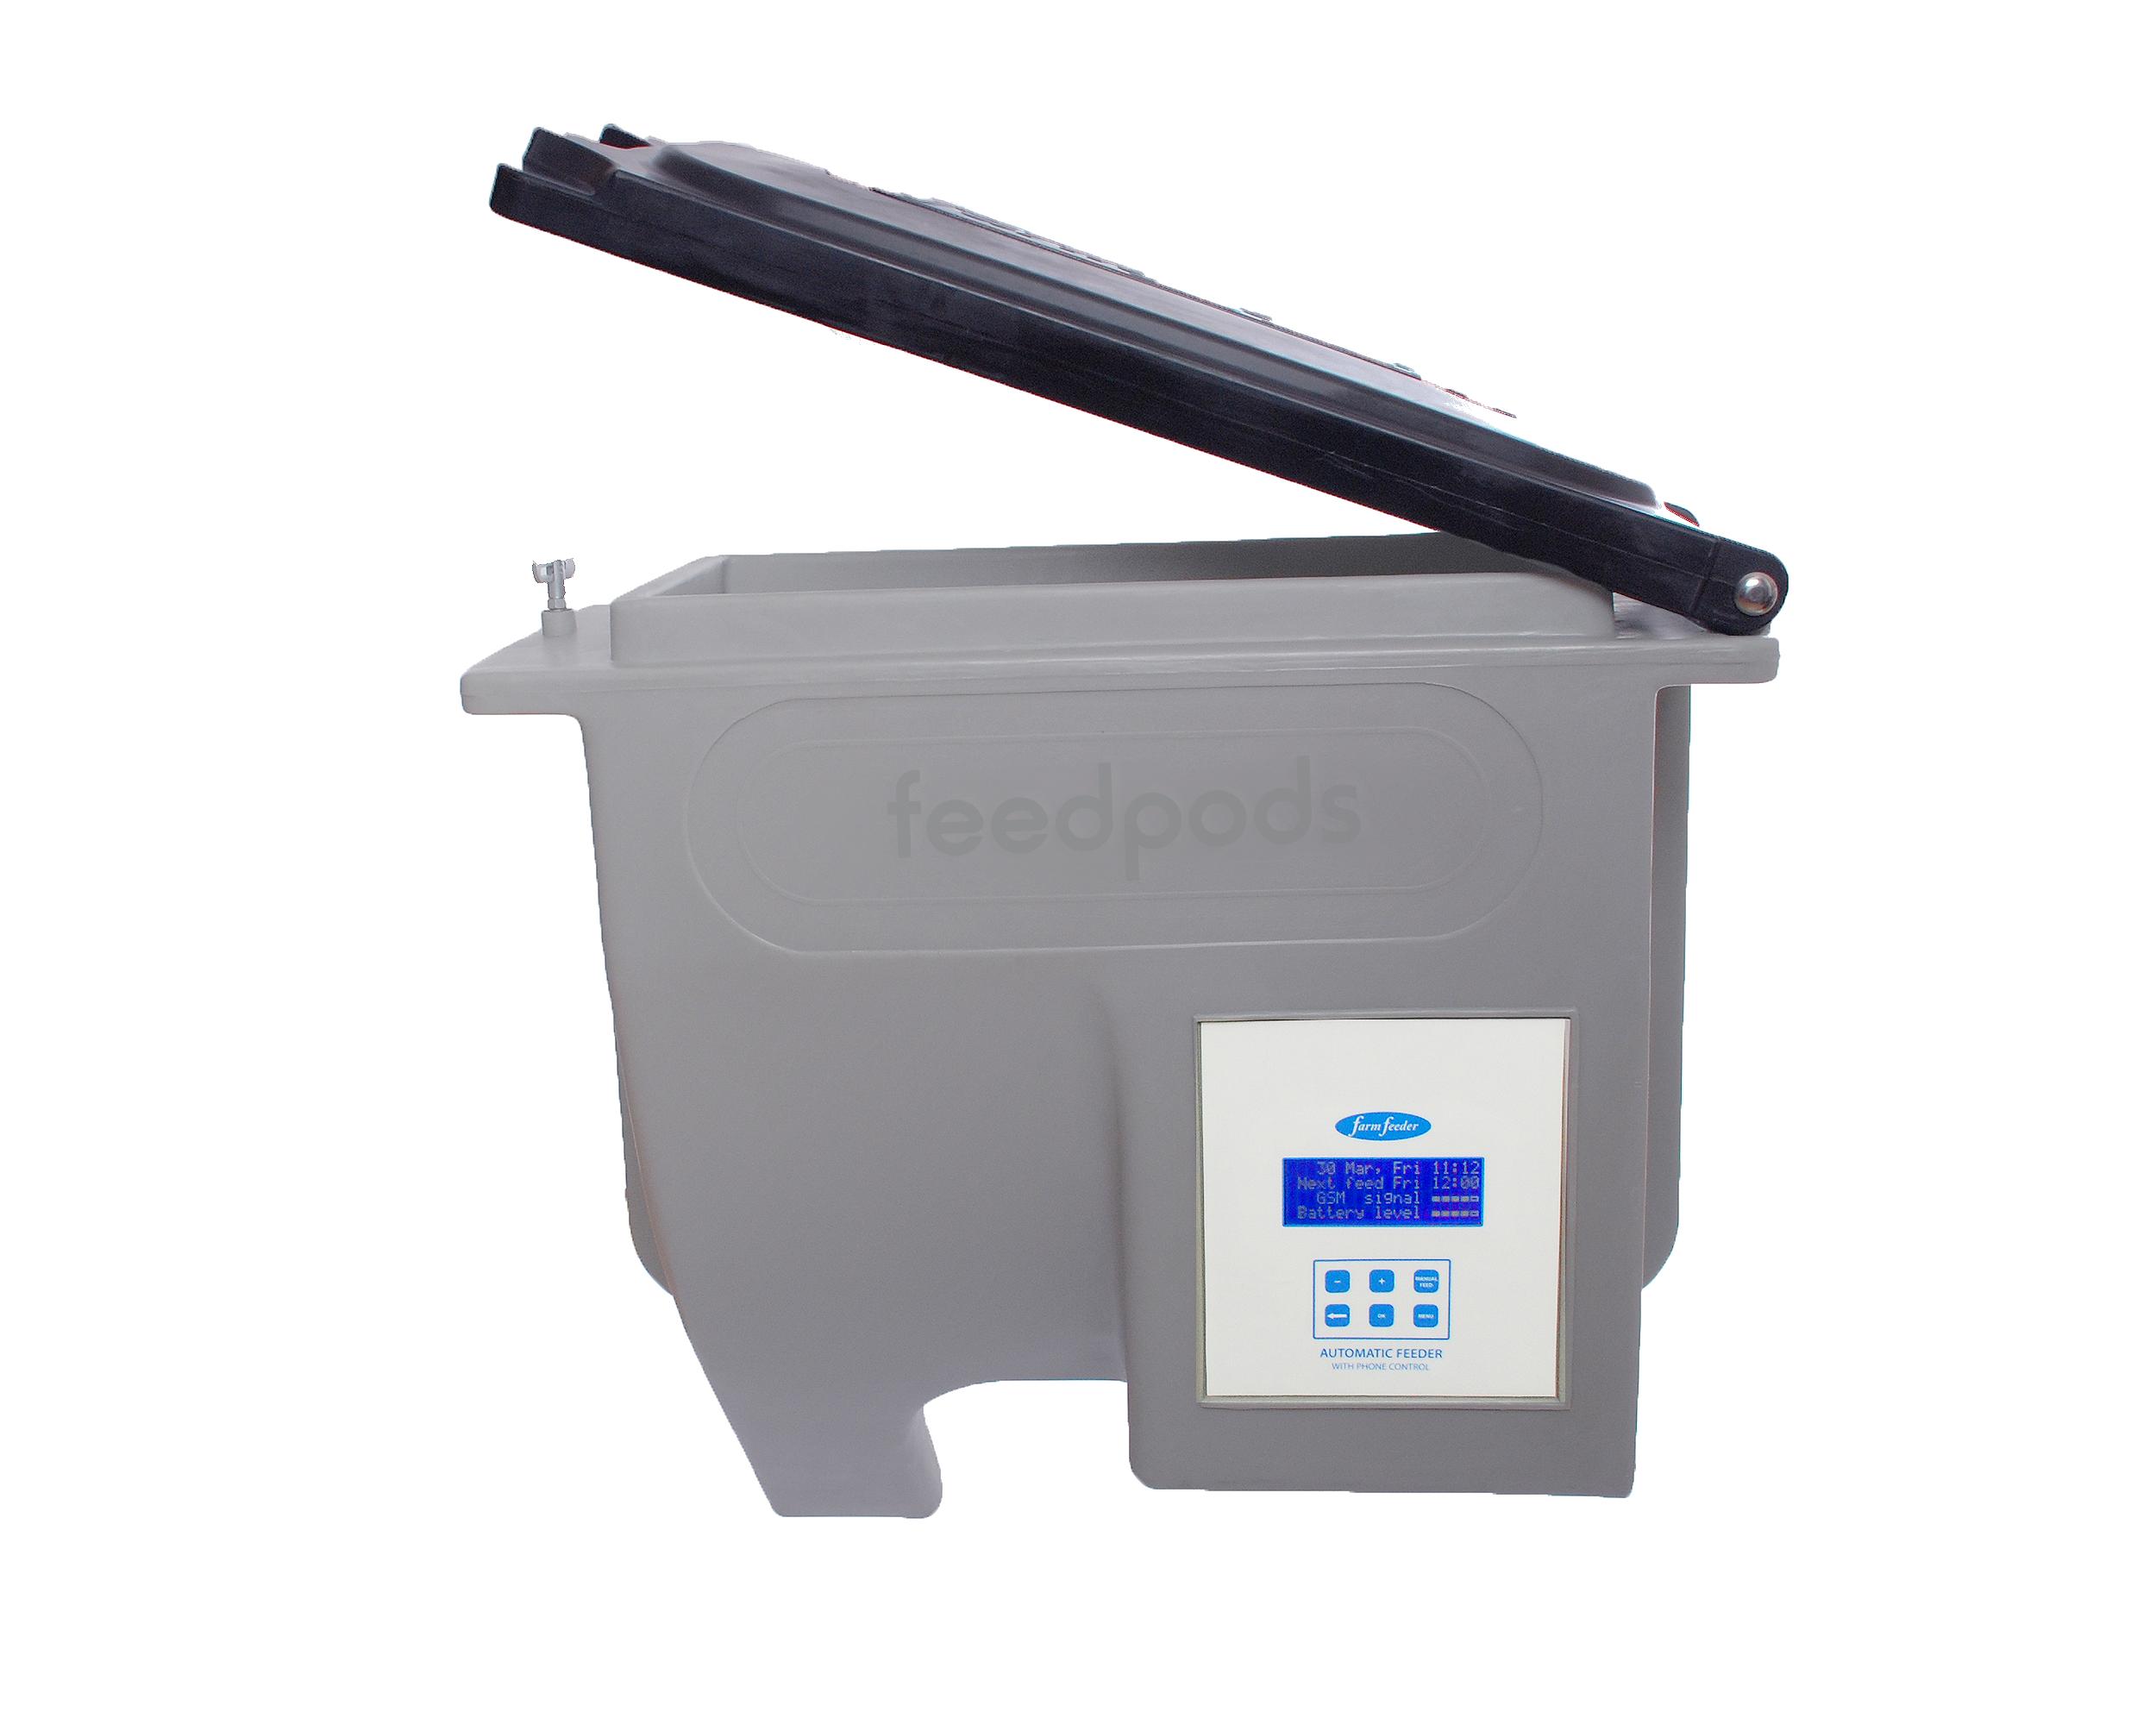 feedpods - Automatic Zoo feeder